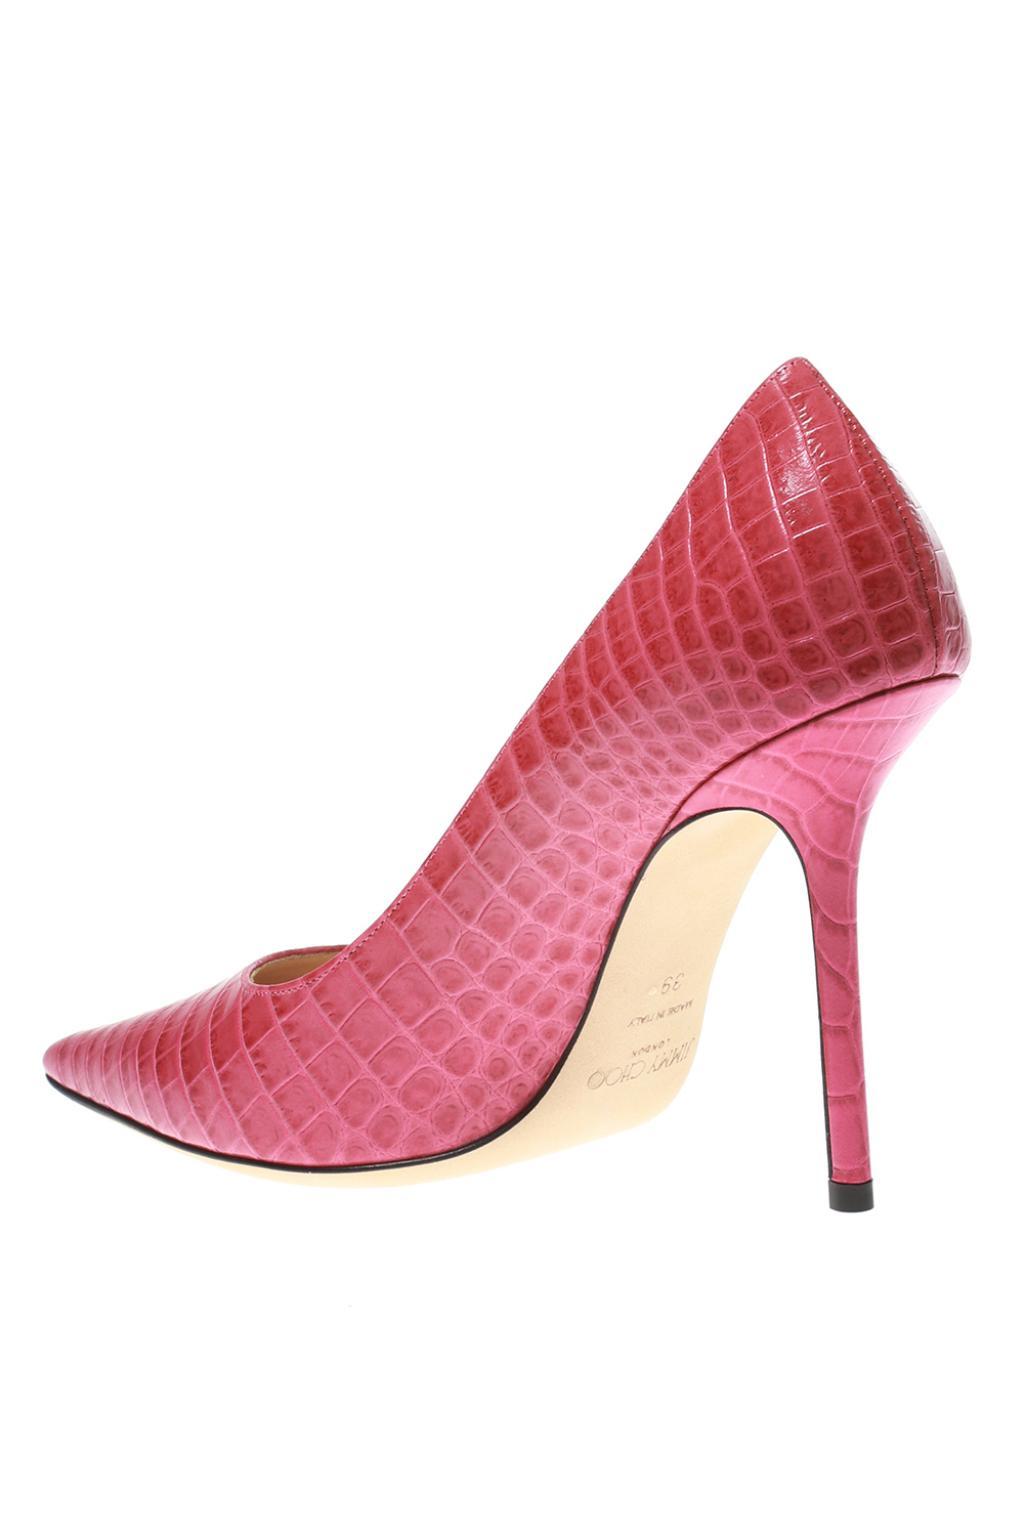 Jimmy Choo 'Love' leather stiletto pumps